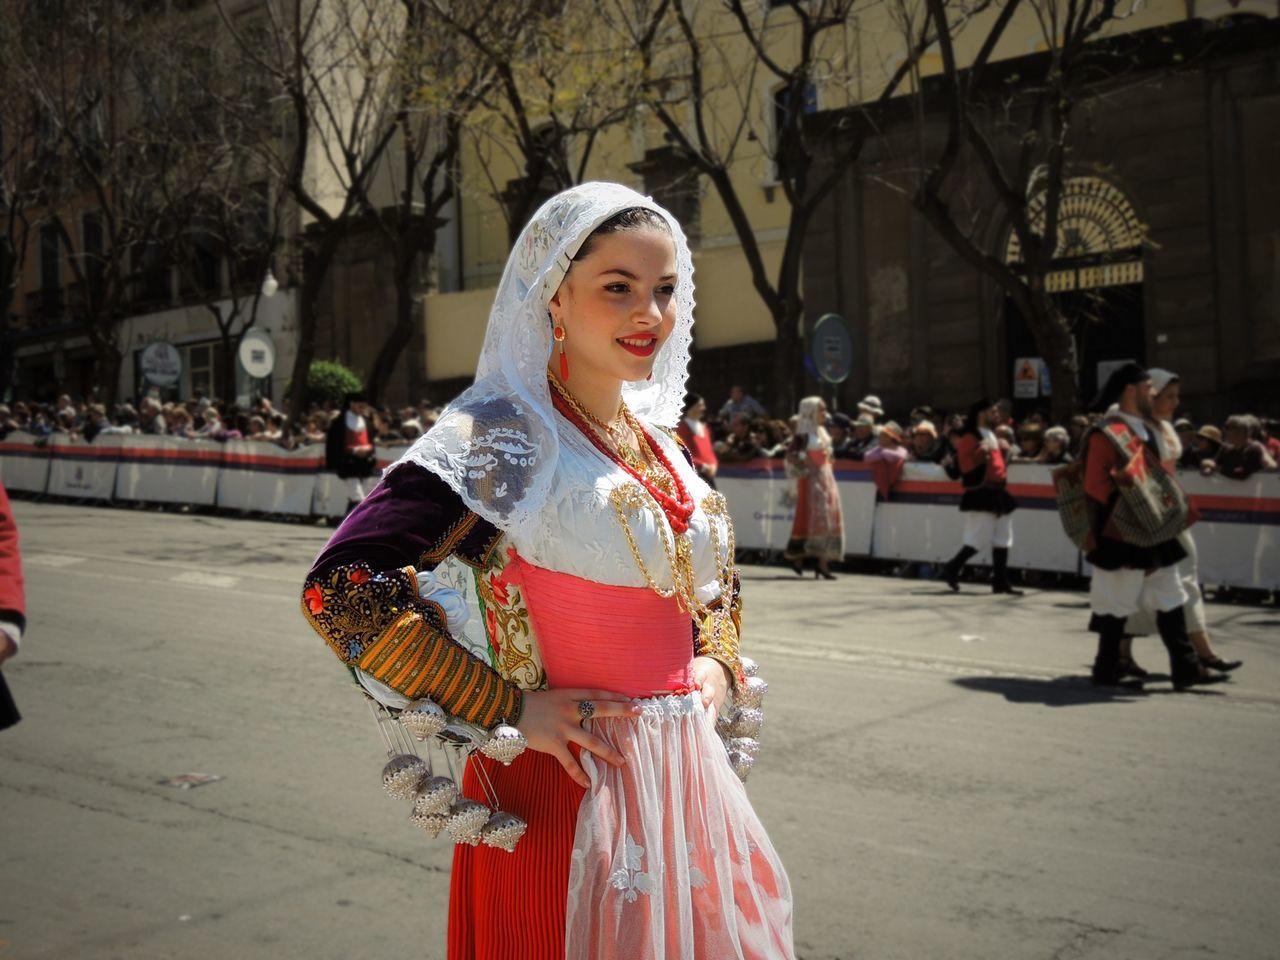 Sardinia Beautiful Girl Sardegna EloediLo Cagliari Traditional Costume Parade Sant'Efis Beauty Ittiri